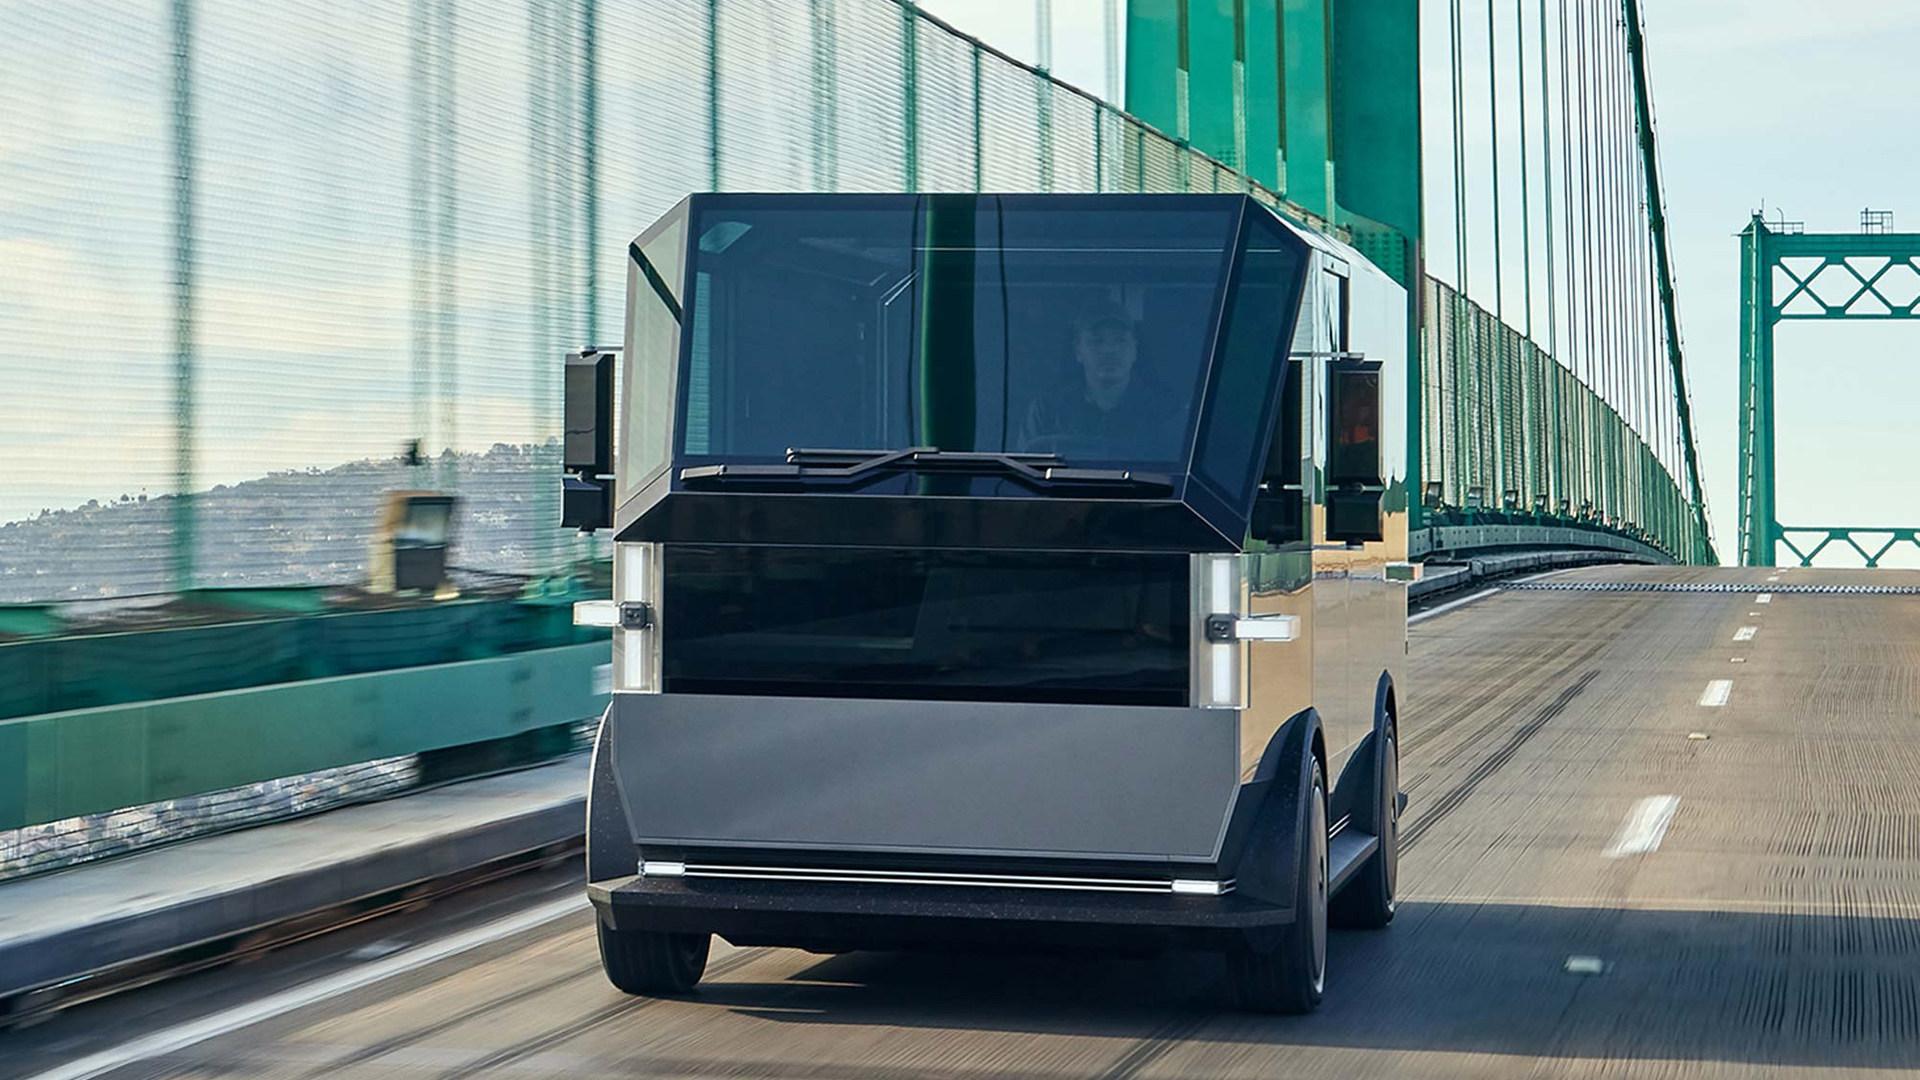 The Canoo multi-purpose delivery vehicle (MPDV) - Concept: On the Road